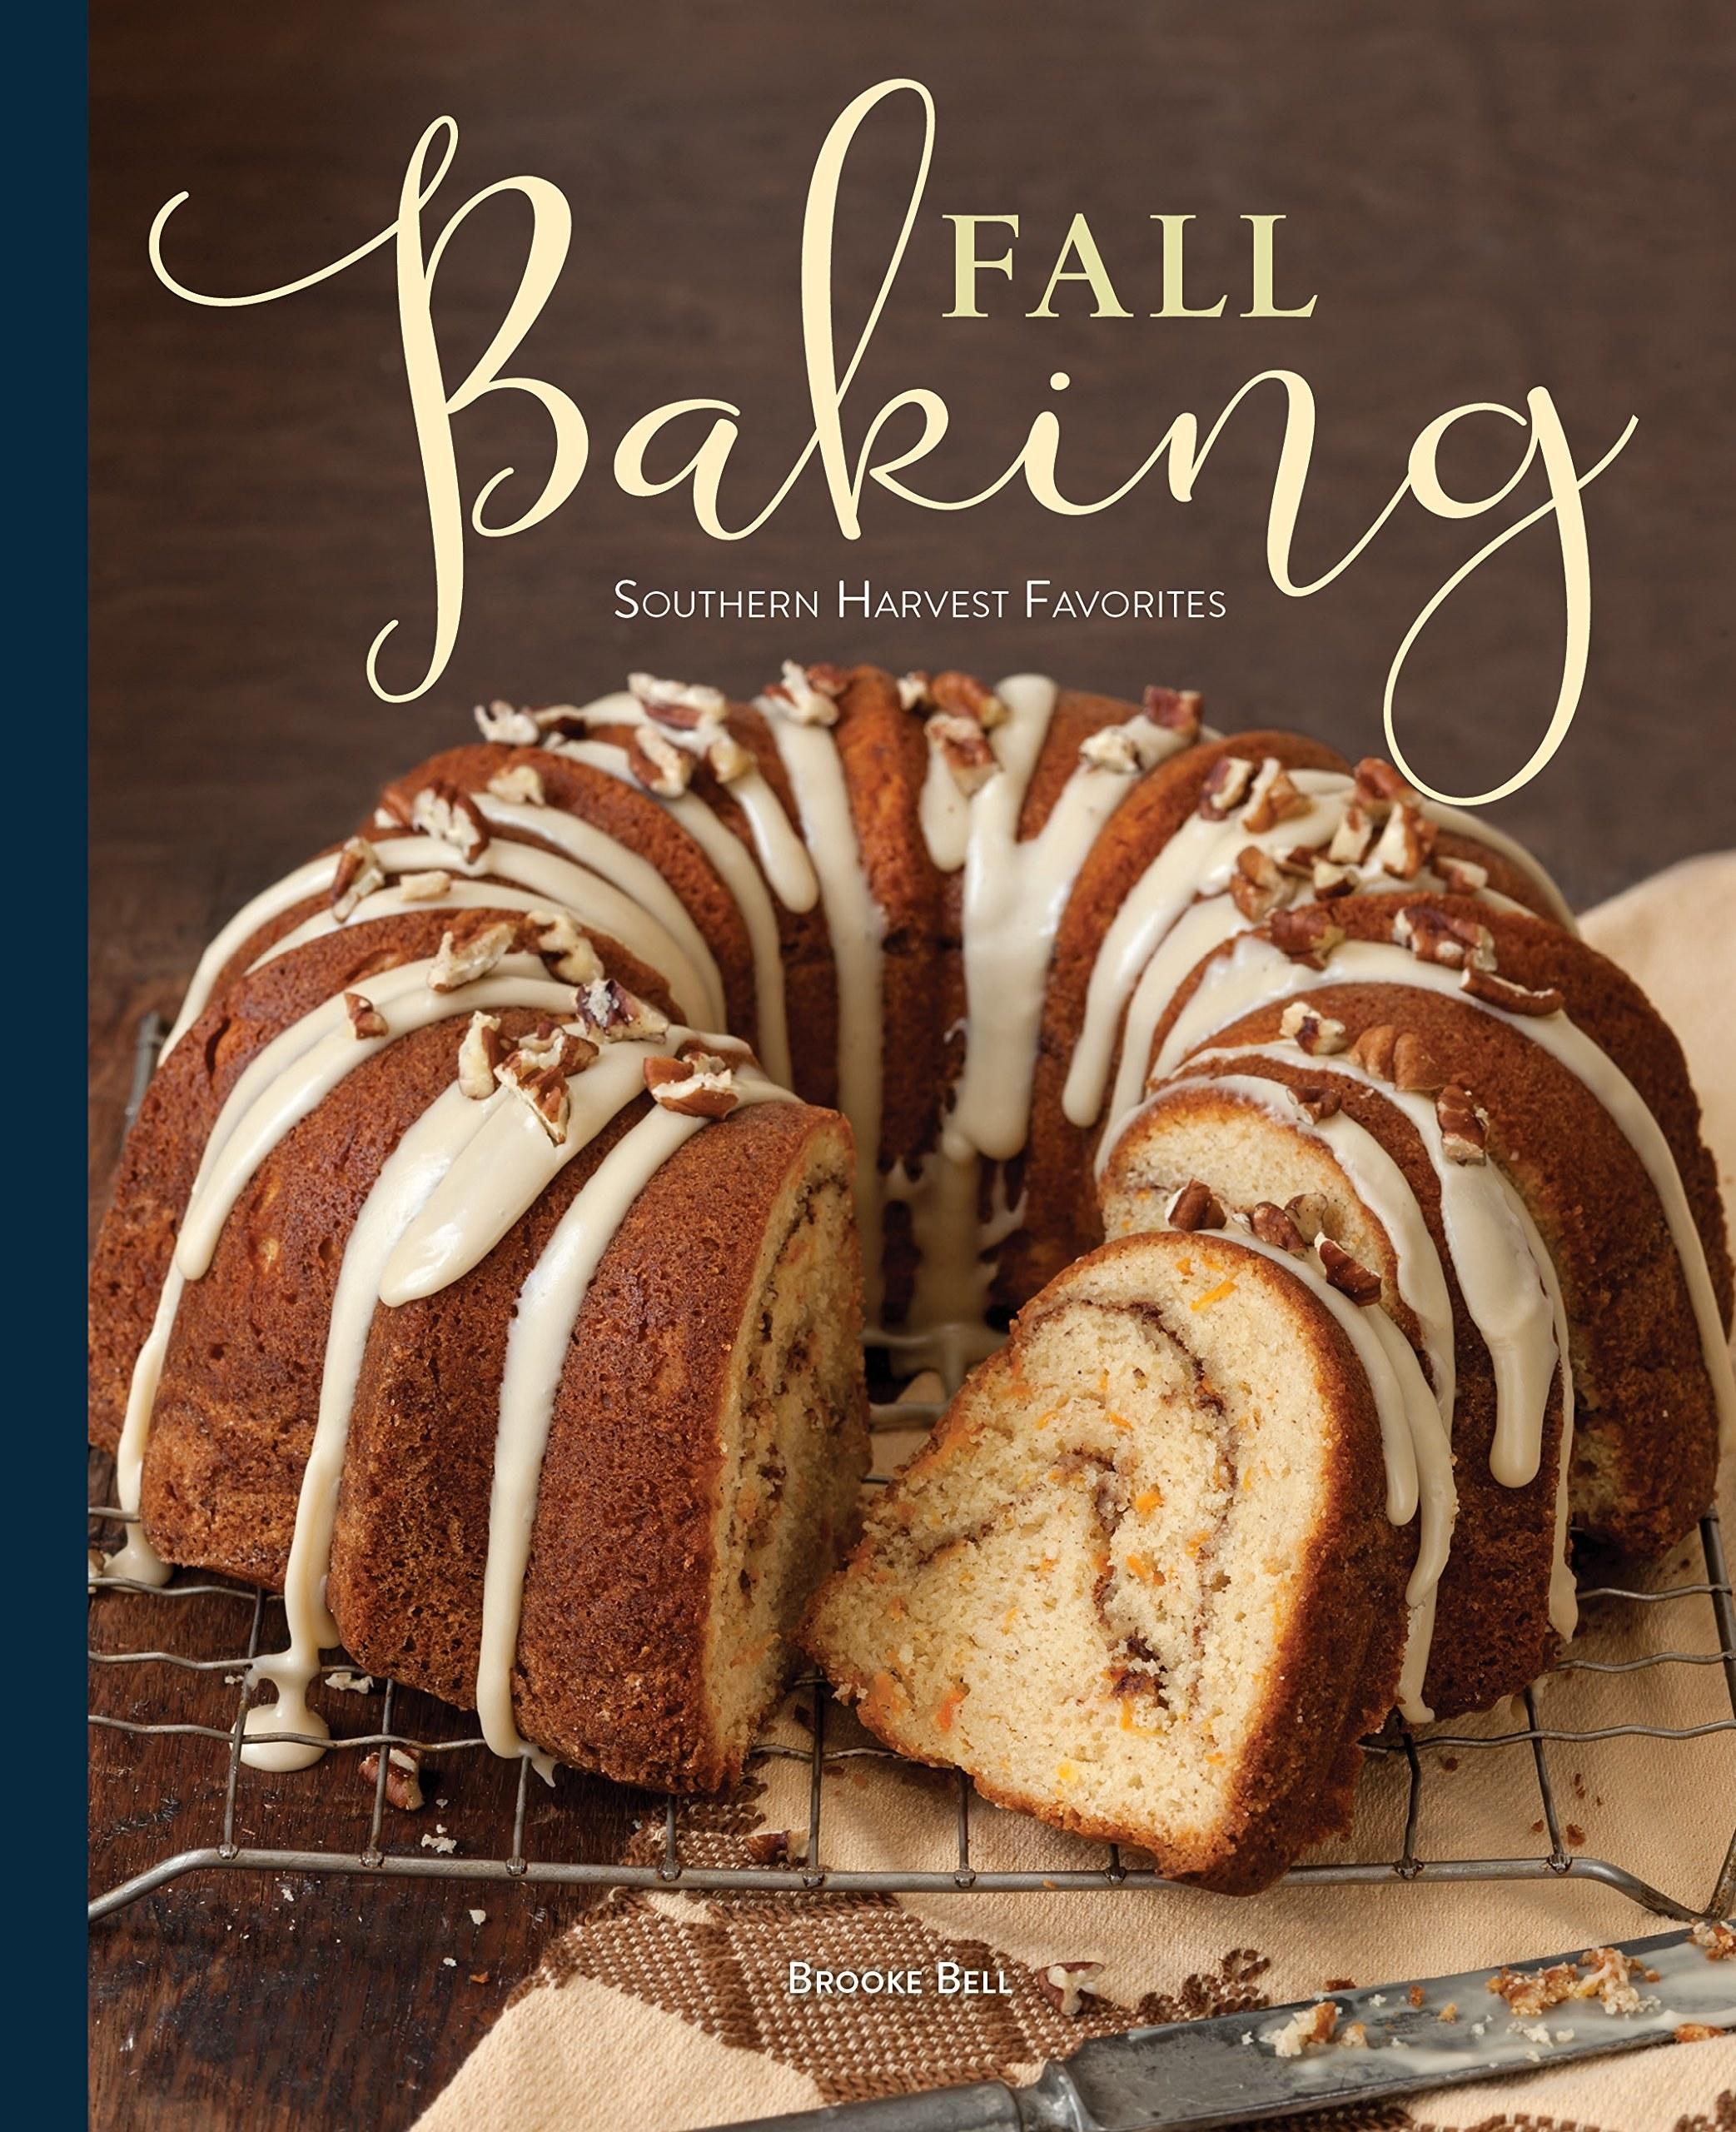 A cookbook called Fall Baking